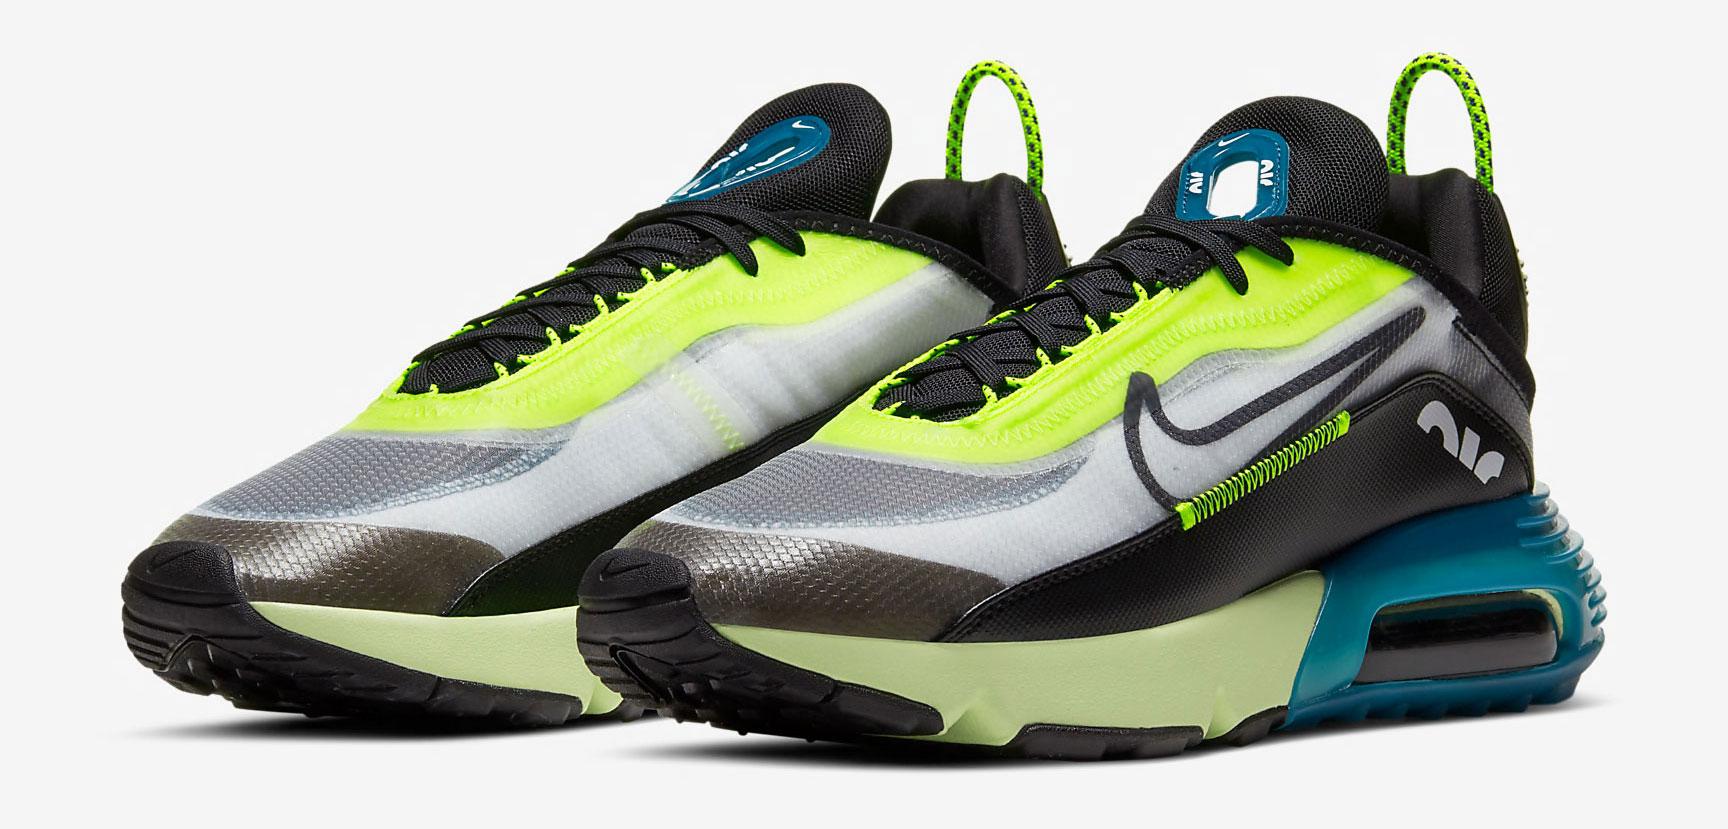 nike-air-max-2090-volt-valerian-blue-sneaker-outfits